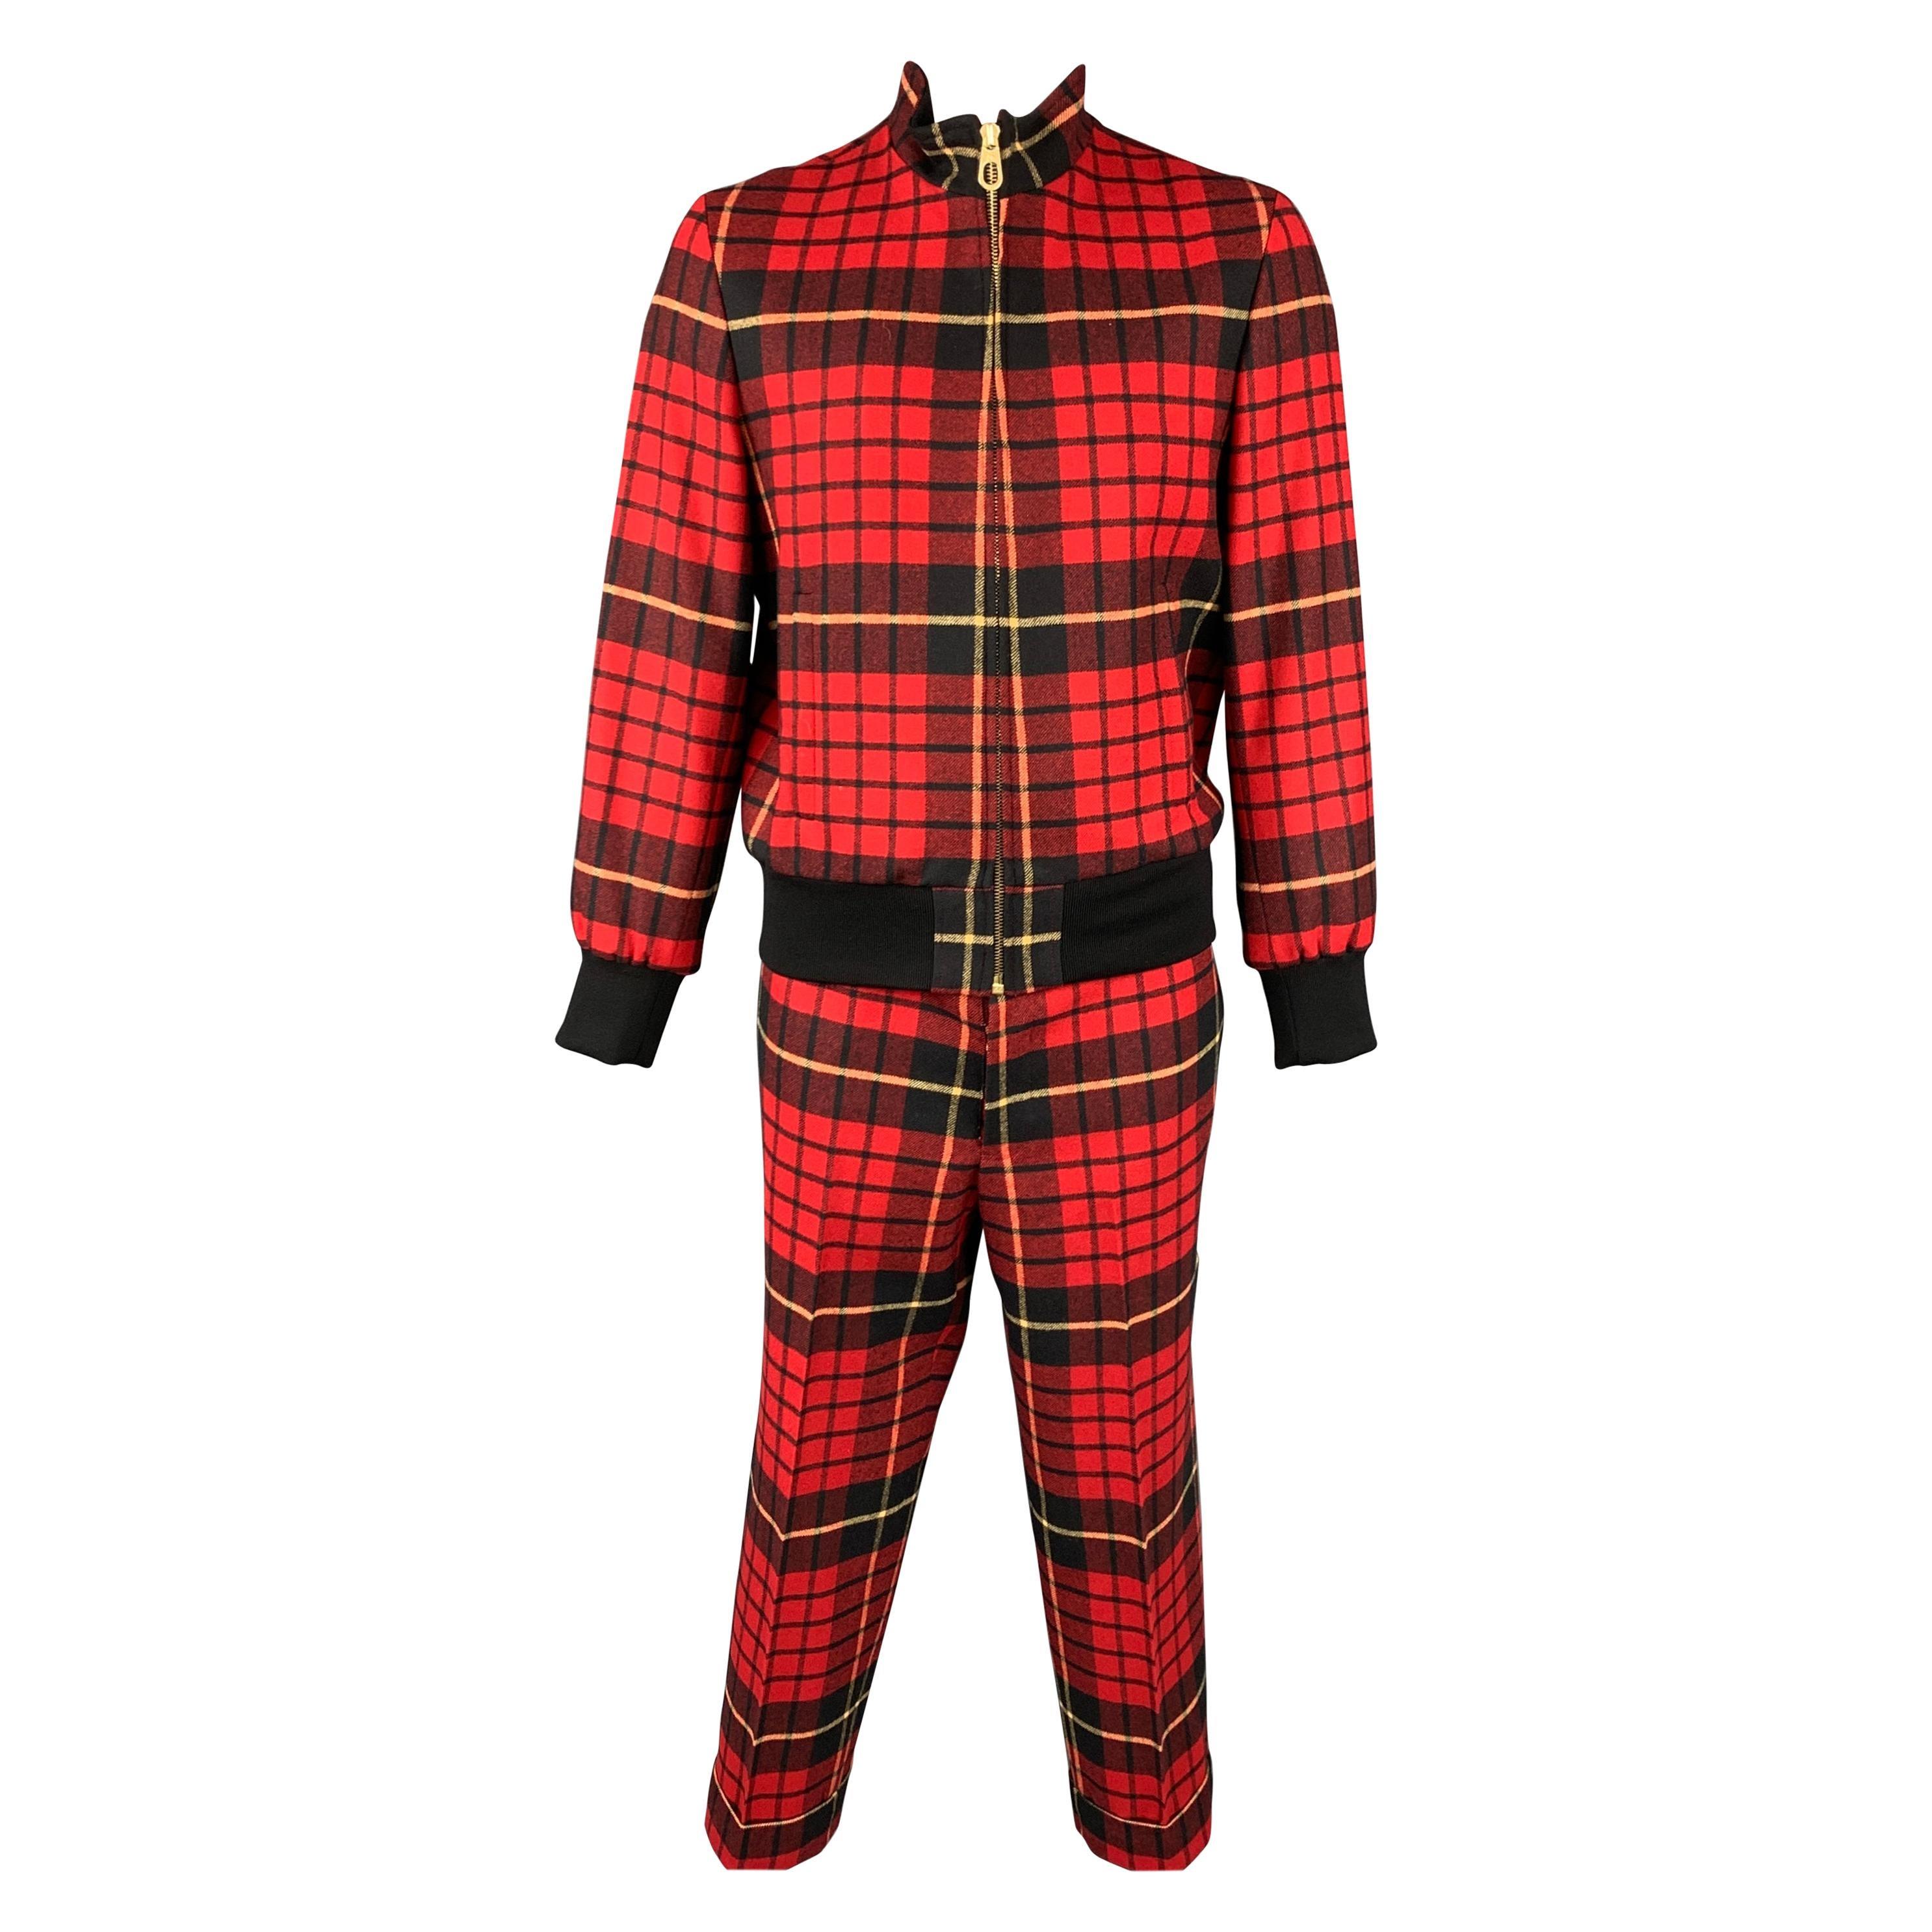 BLACK FLEECE Size 44 Red & Black Plaid Wool Zip Up Jacket & Pants Set